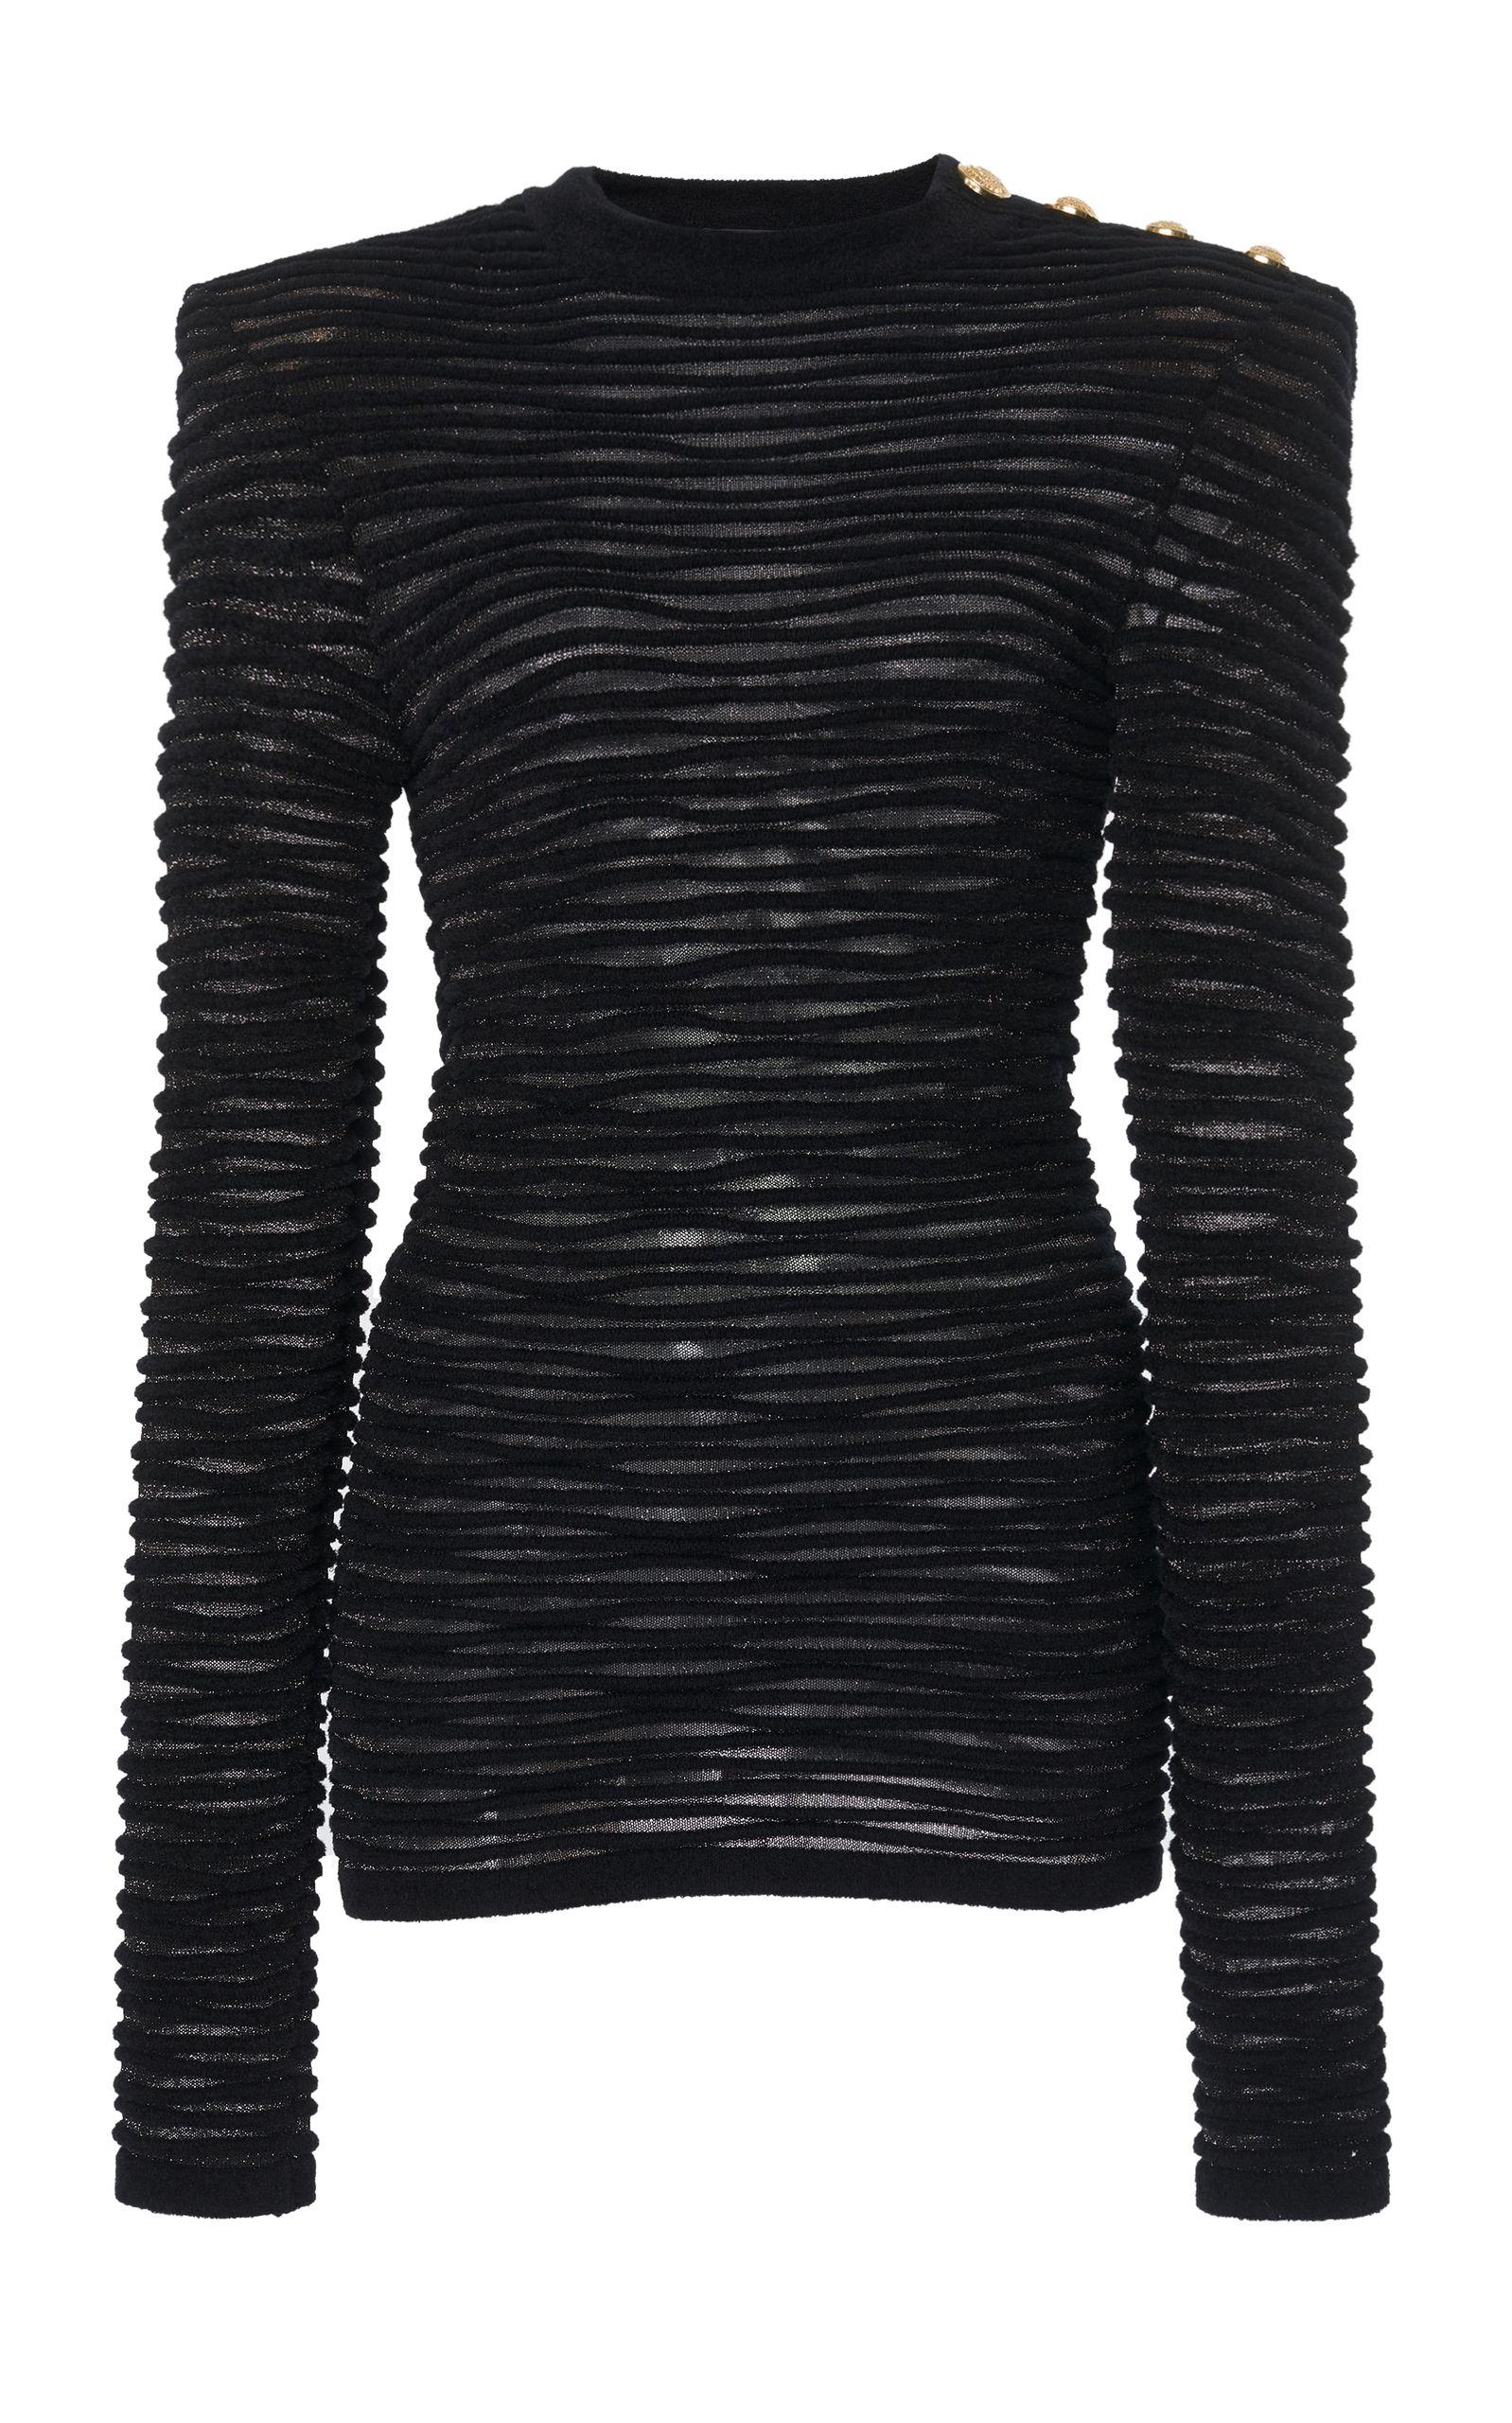 Ribbed Velour Top by Balmain | Moda Operandi | Velour tops